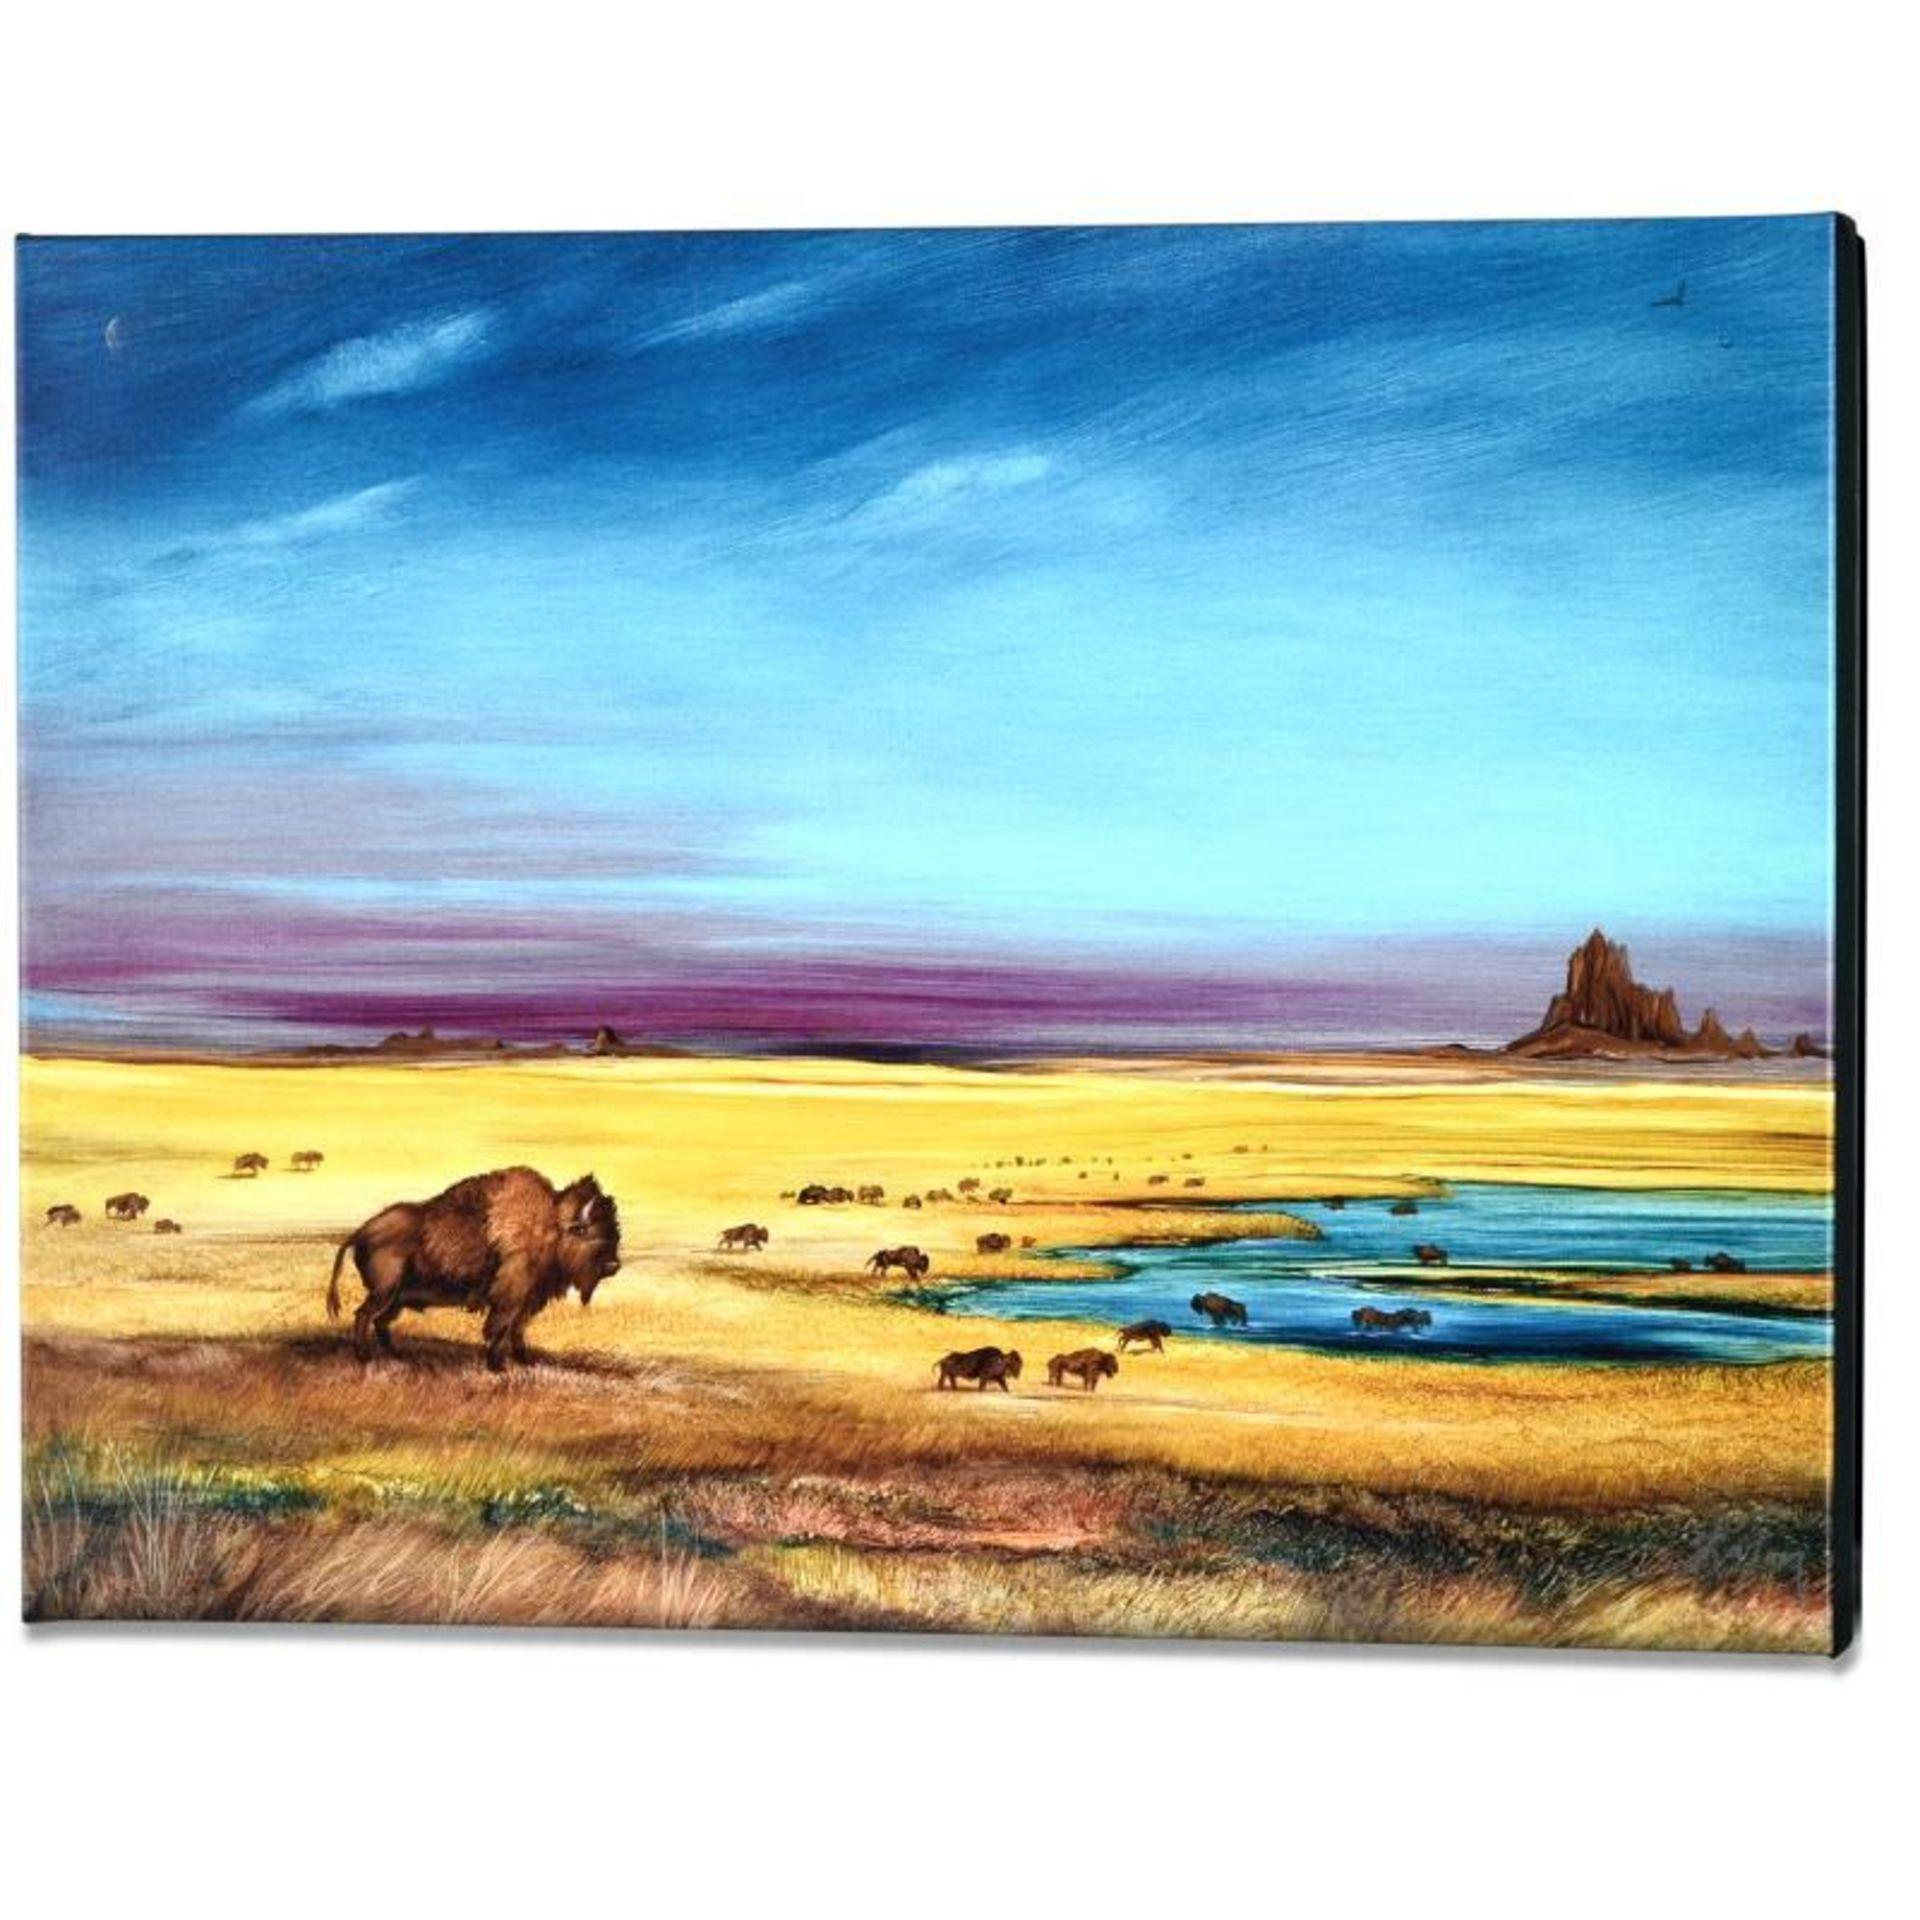 Where the Buffalo by Katon, Martin - Image 4 of 4